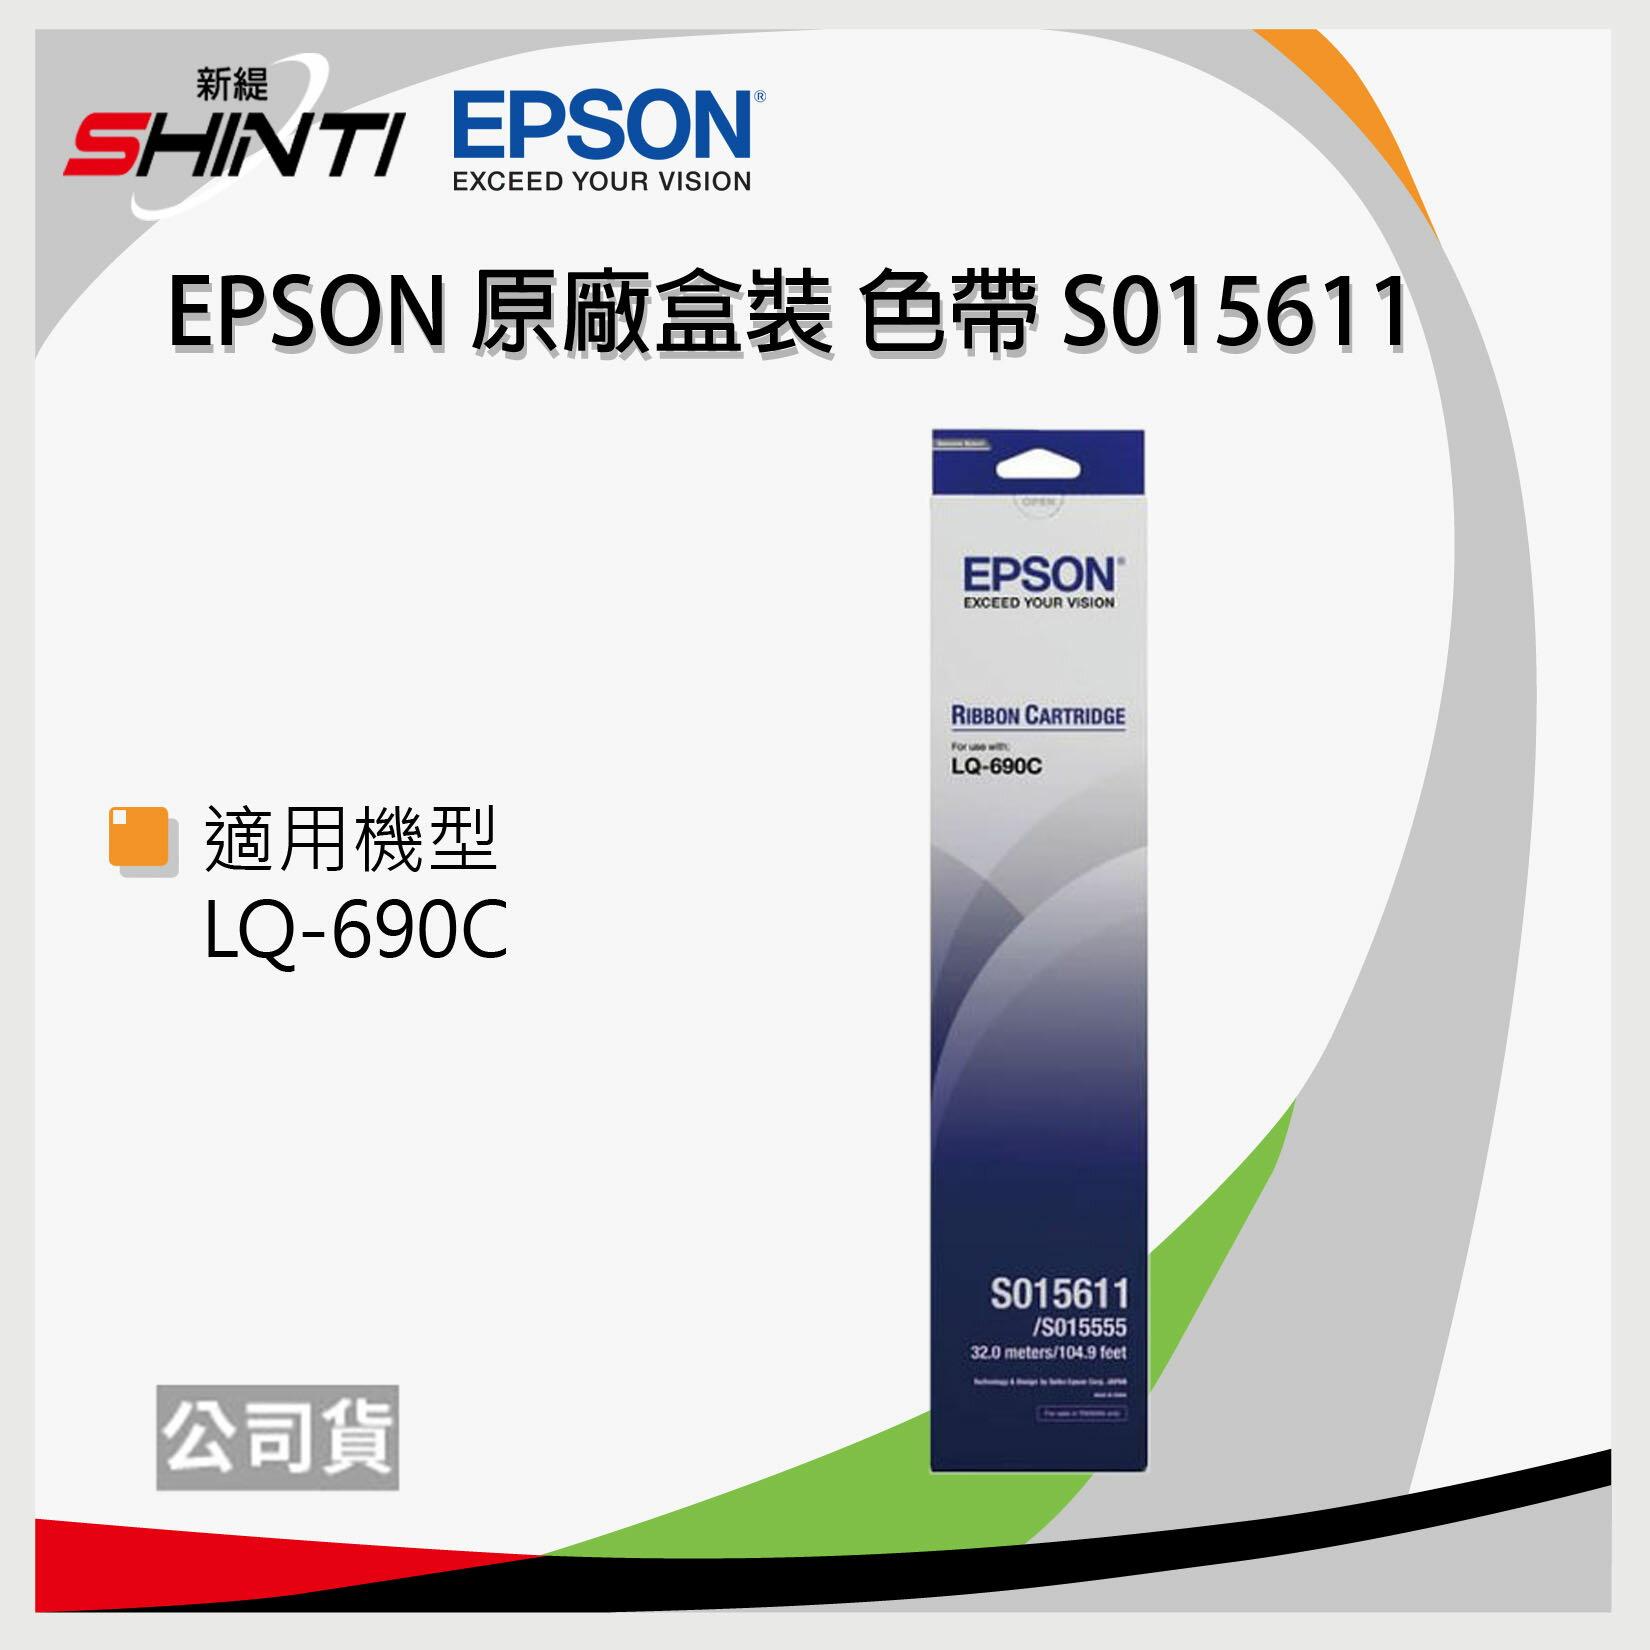 【單支】EPSON LQ-690C LQ-695C 原廠黑色色帶 S015611 / S015555